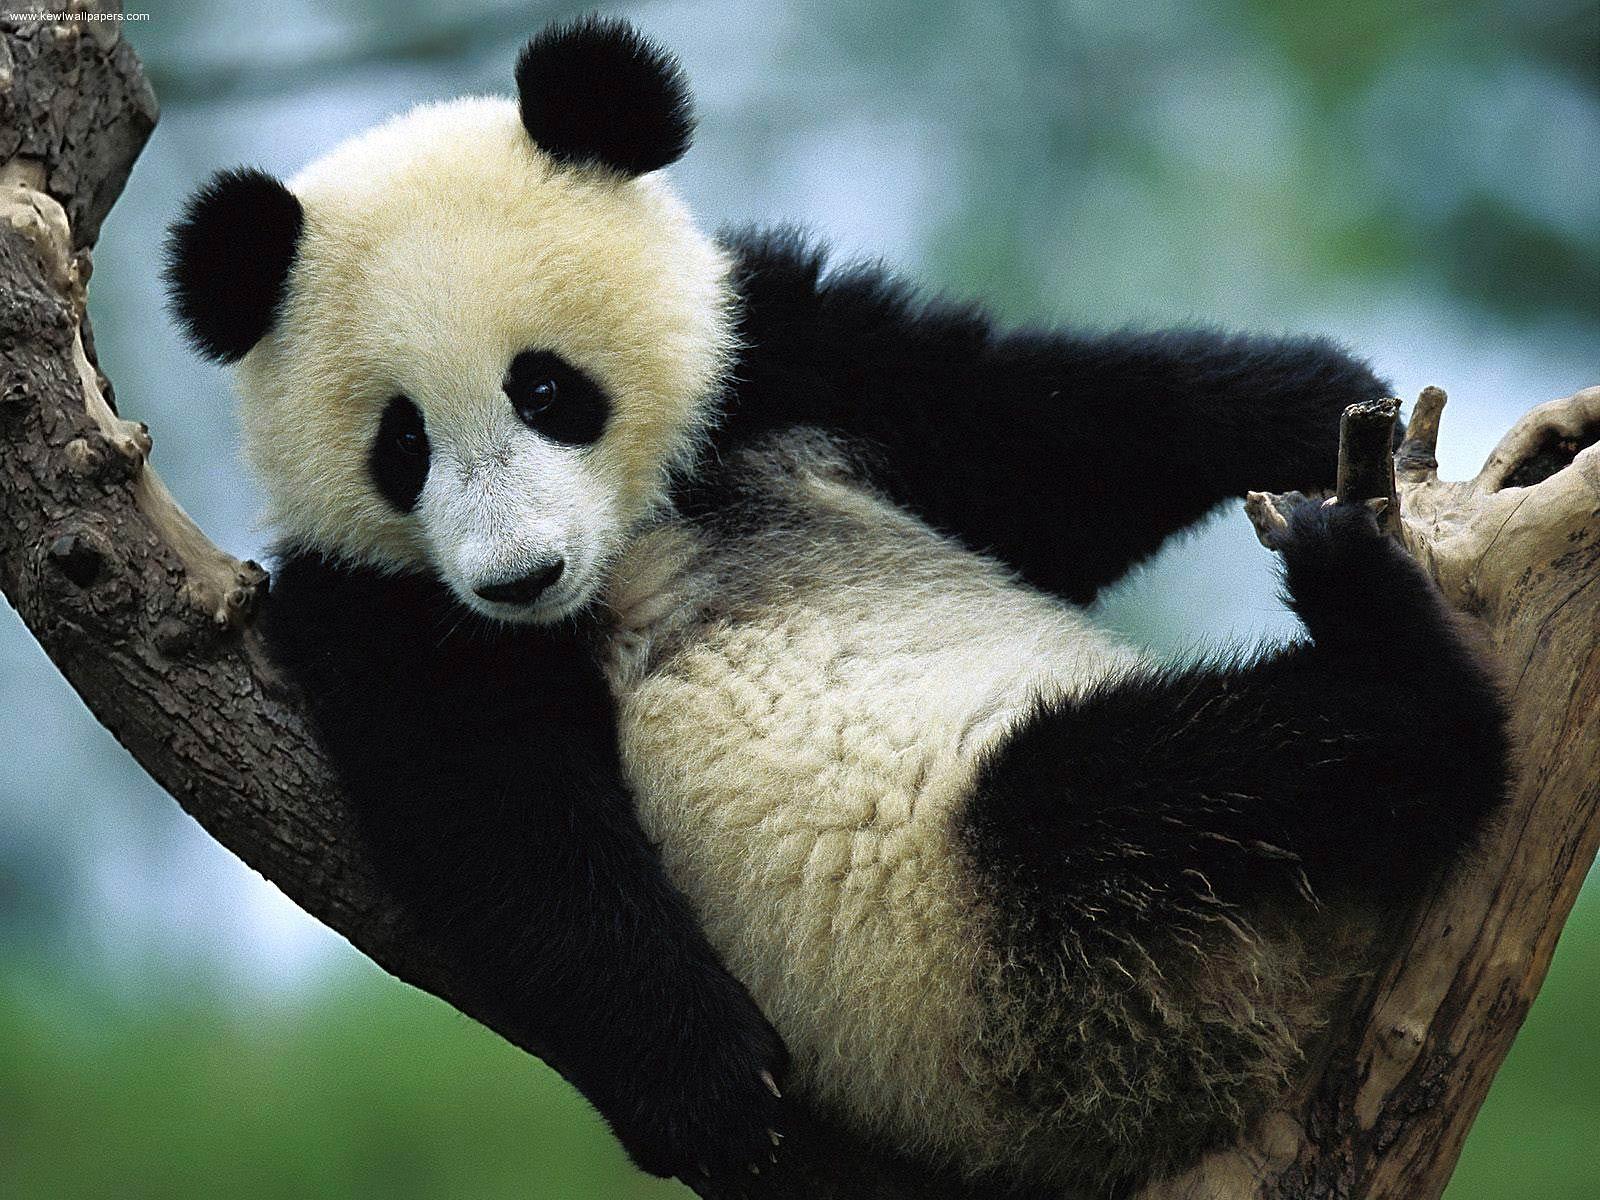 Wonderful Wallpaper Mobile Animal - giant-panda-wallpaper-6  You Should Have_78268.jpg